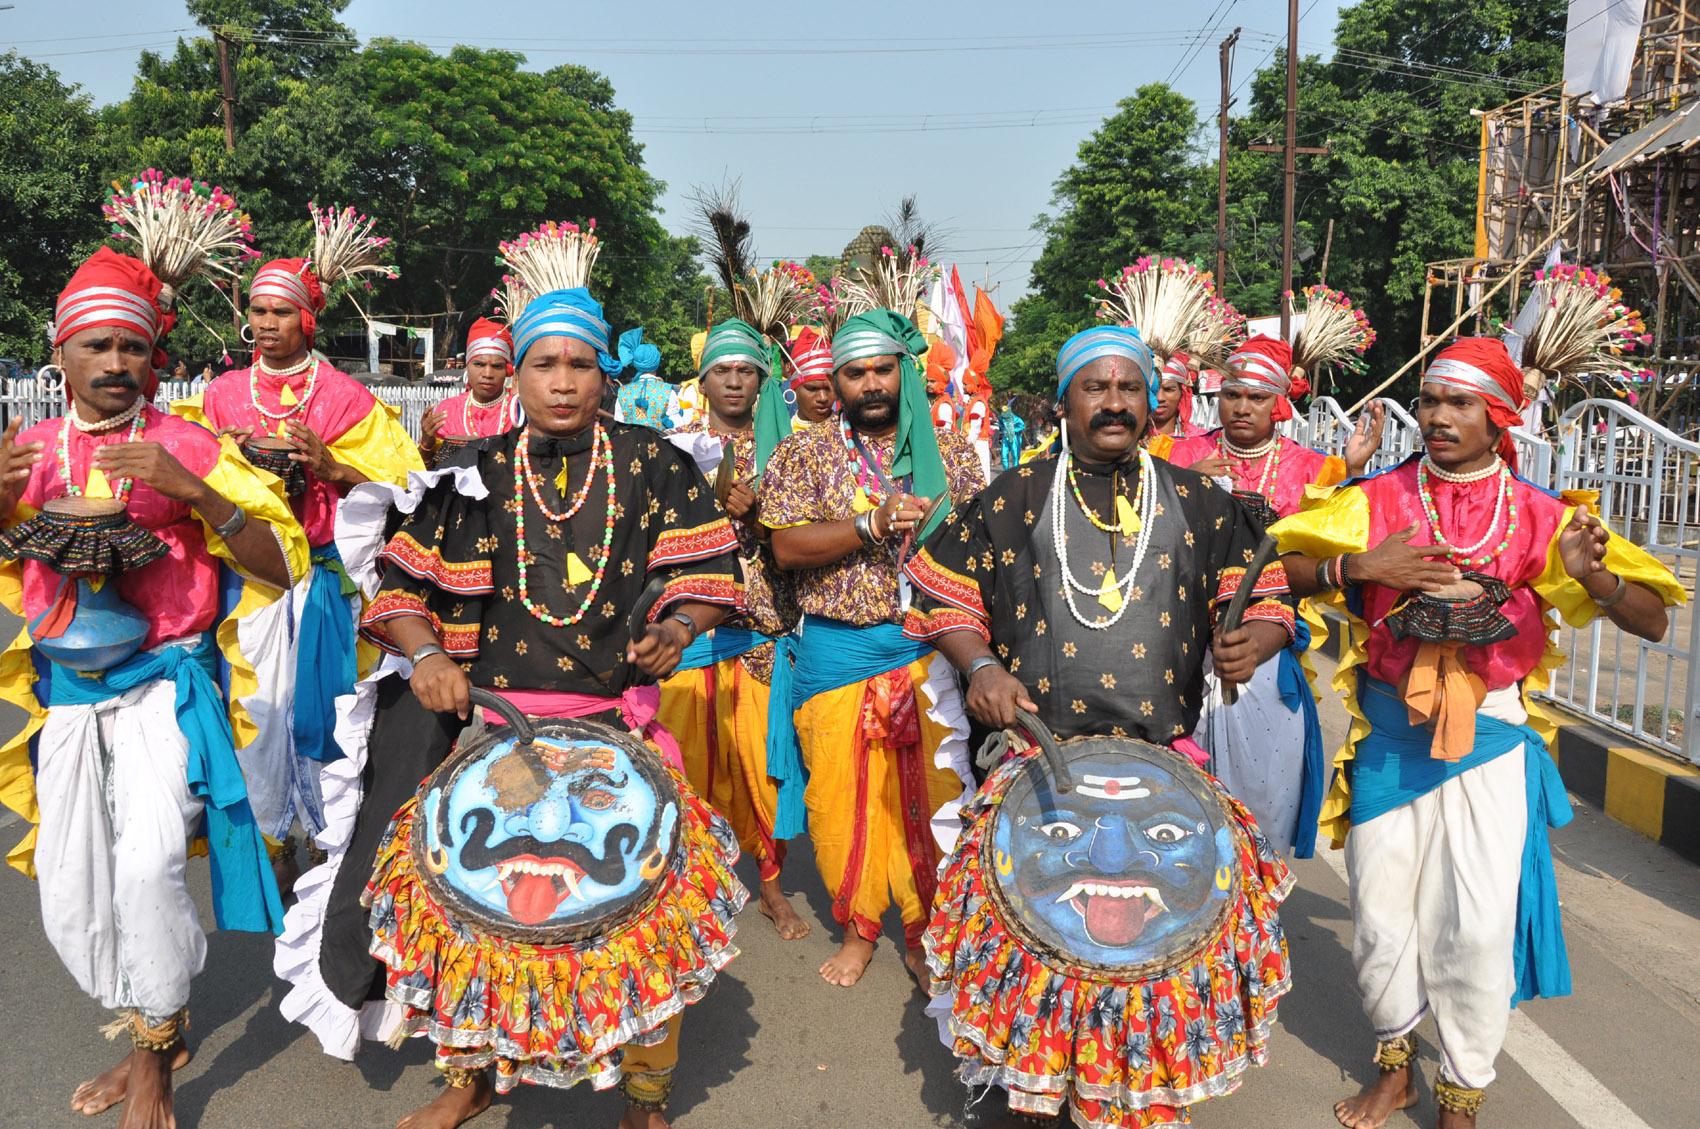 world tourism carnival bhubaneswar buzz 2